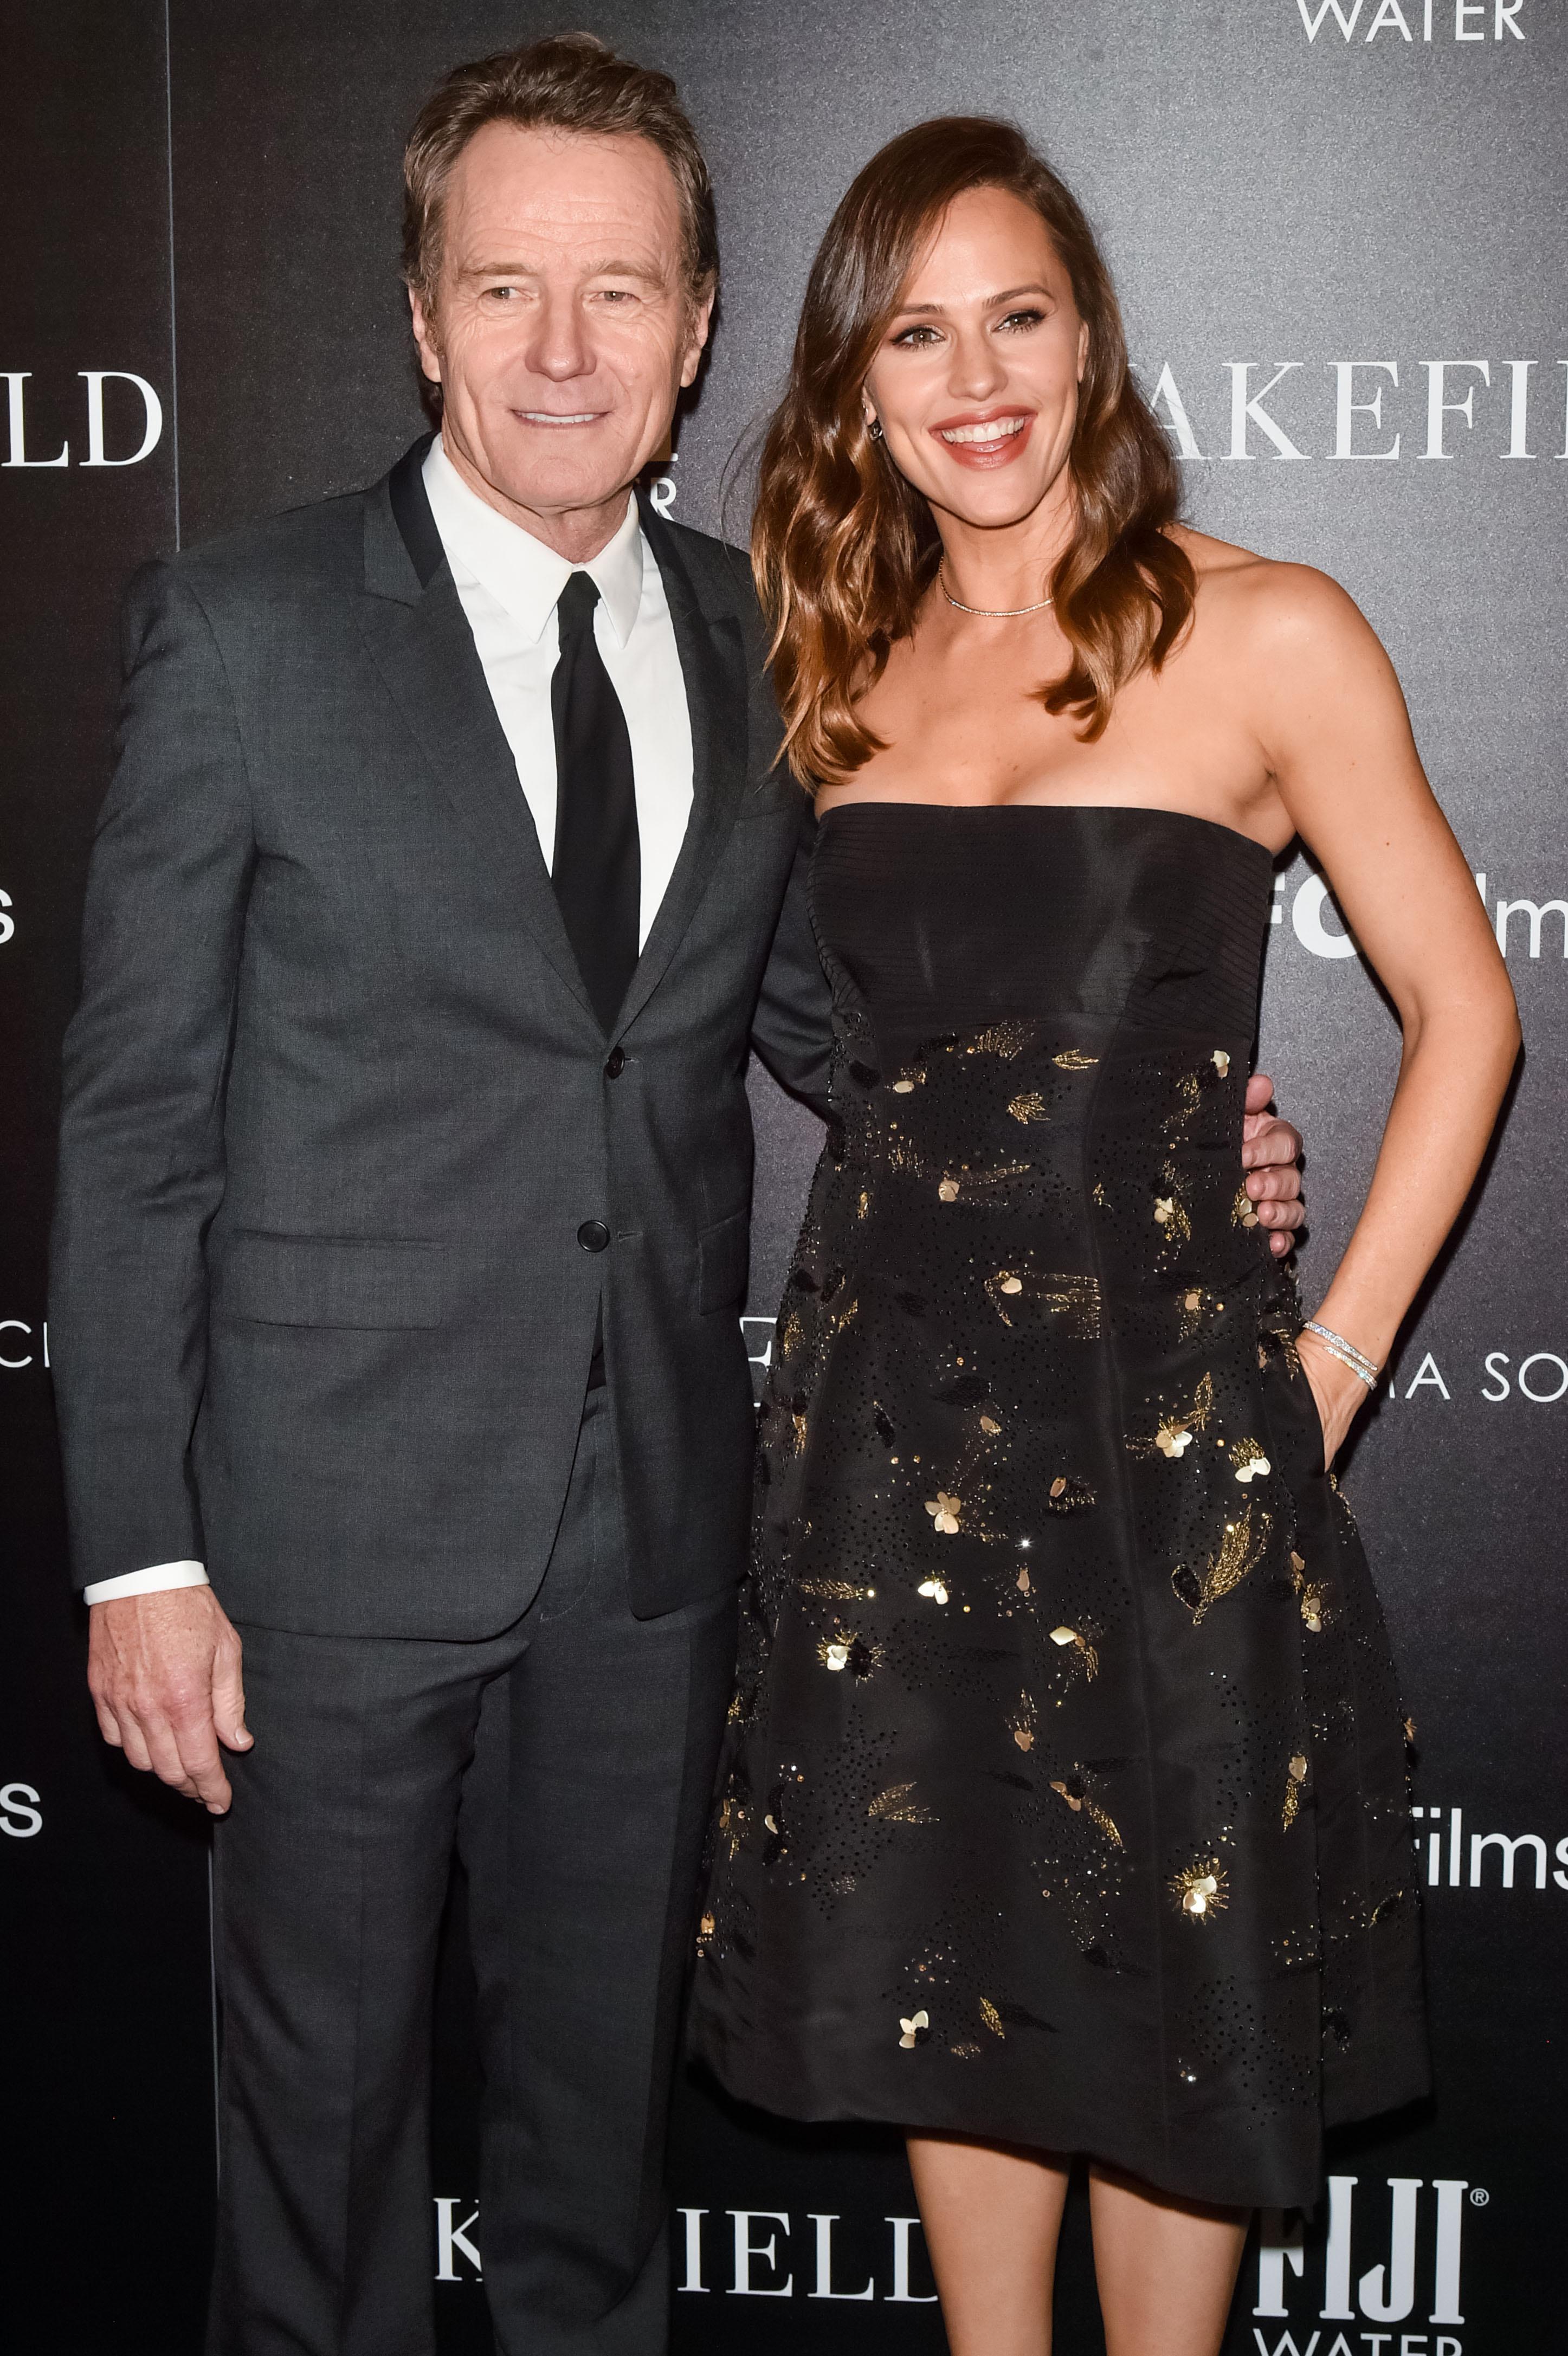 Bryan Cranston, Jennifer Garner'Wakefield' film screening, Arrivals, New York, USA - 18 May 2017